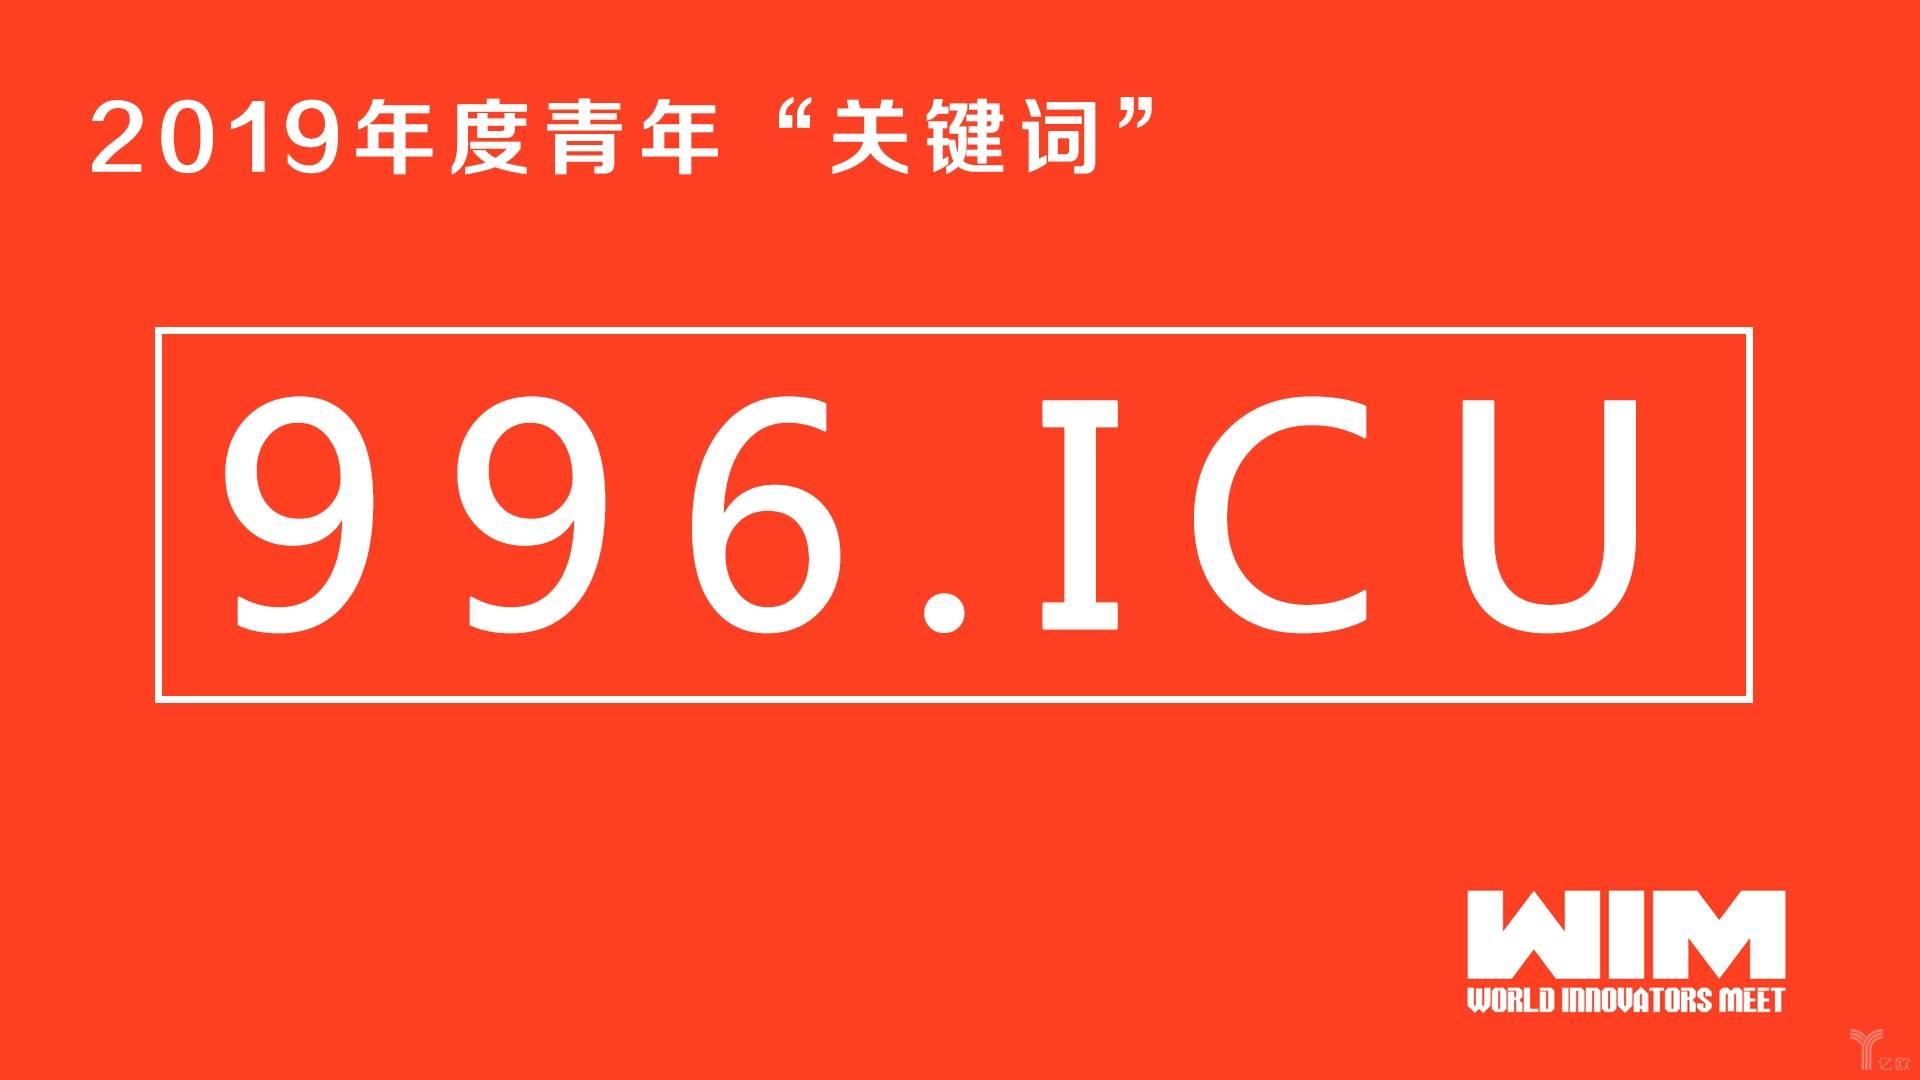 996.ICU .jpg